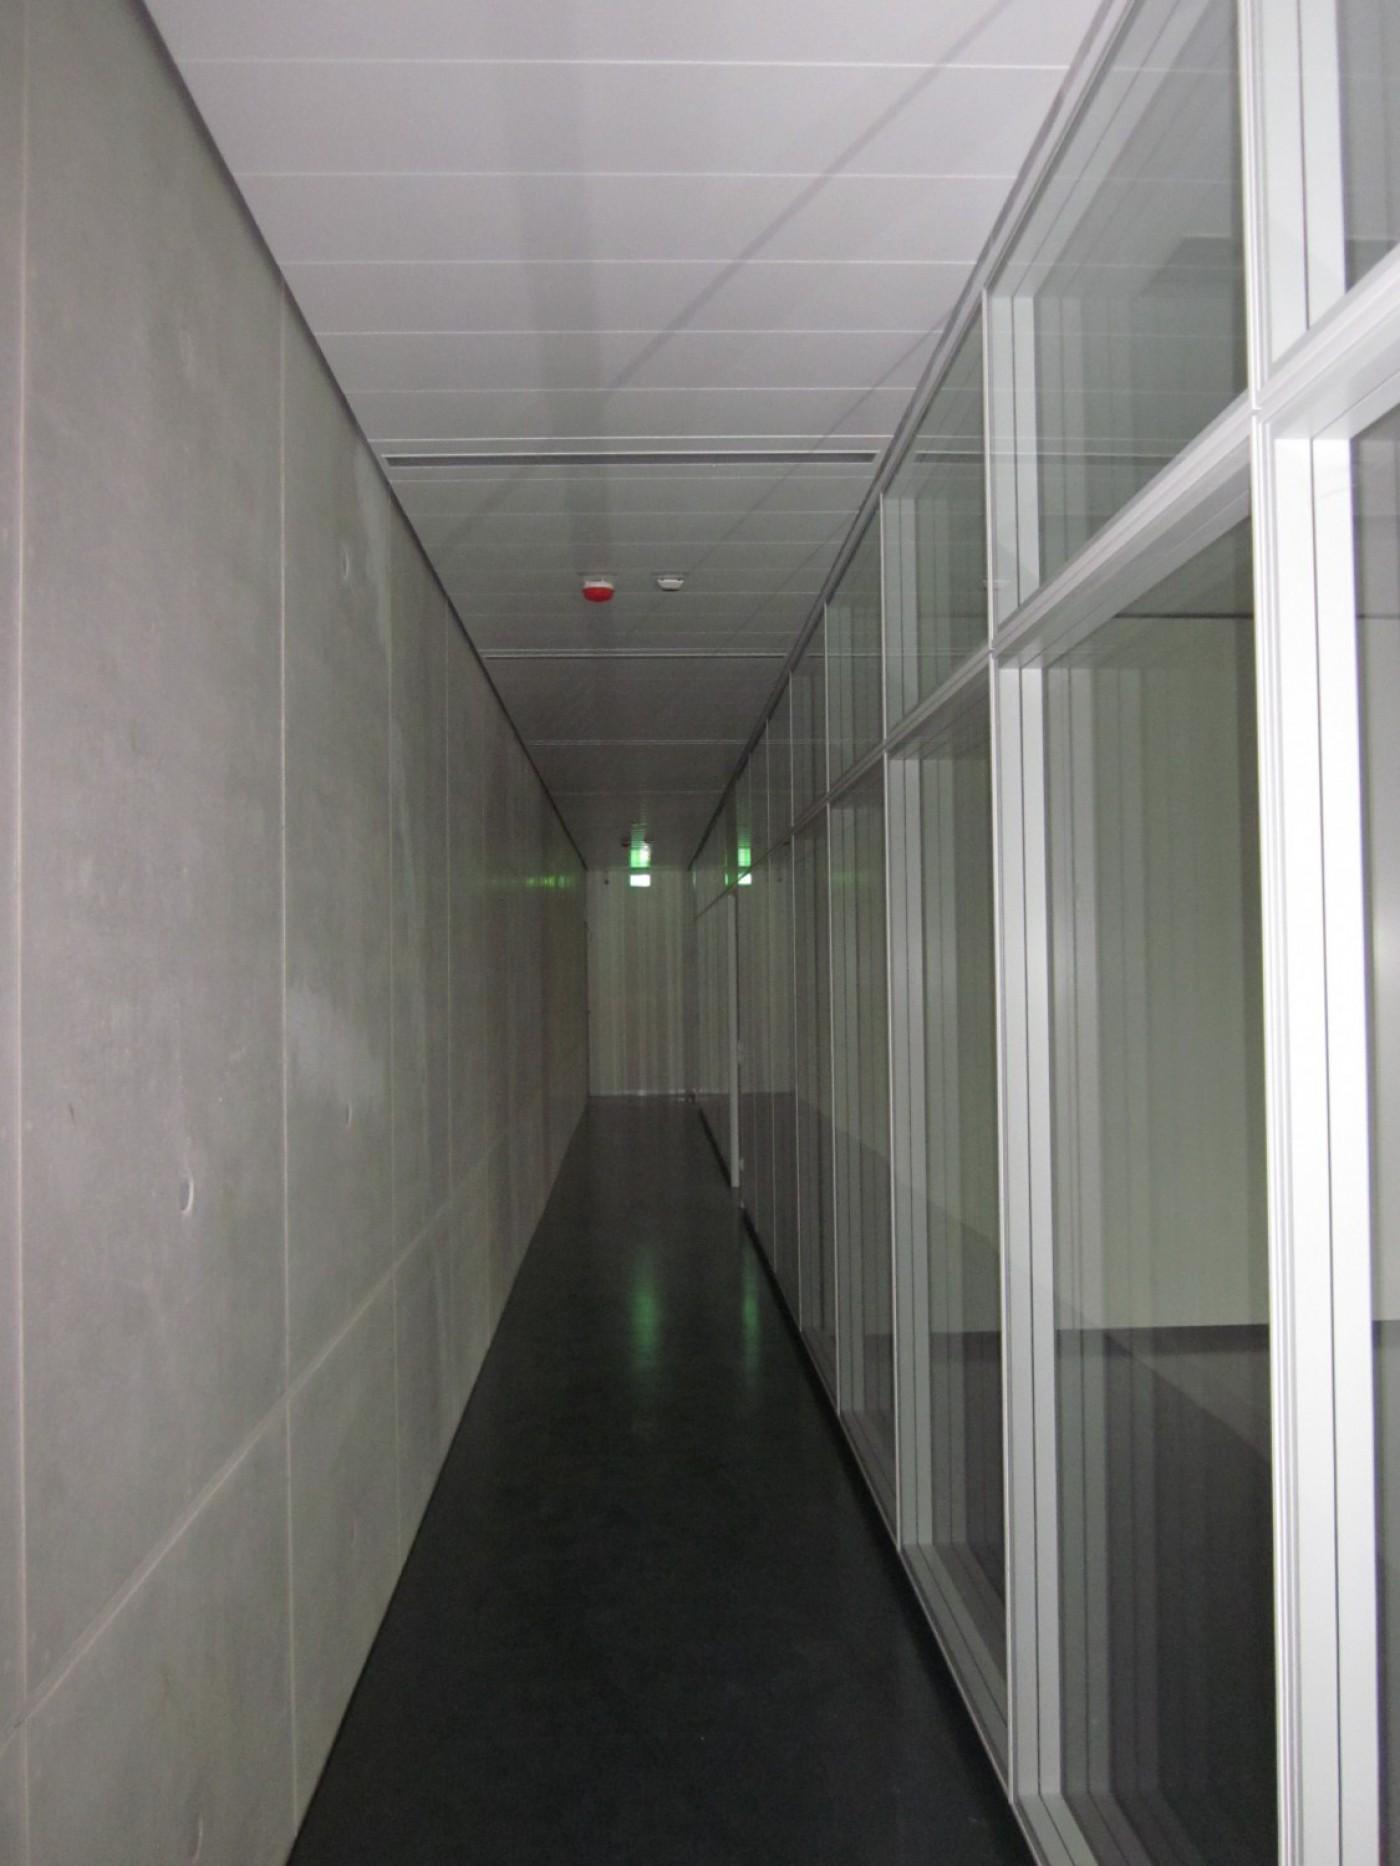 ww_Gesundheit_Klinikapotheke_Mannheim_4c_4